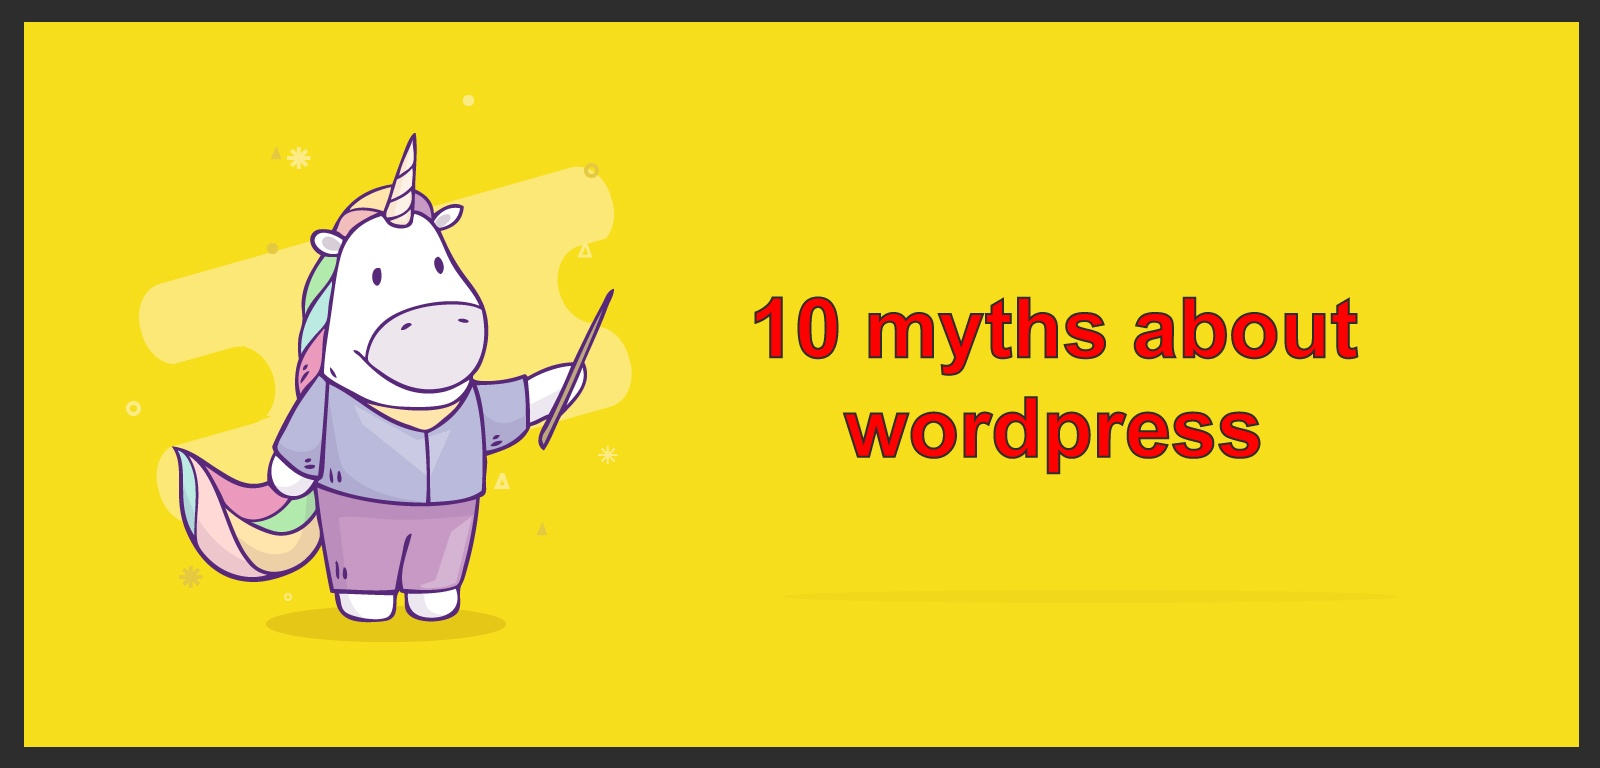 10 Myths about WordPress